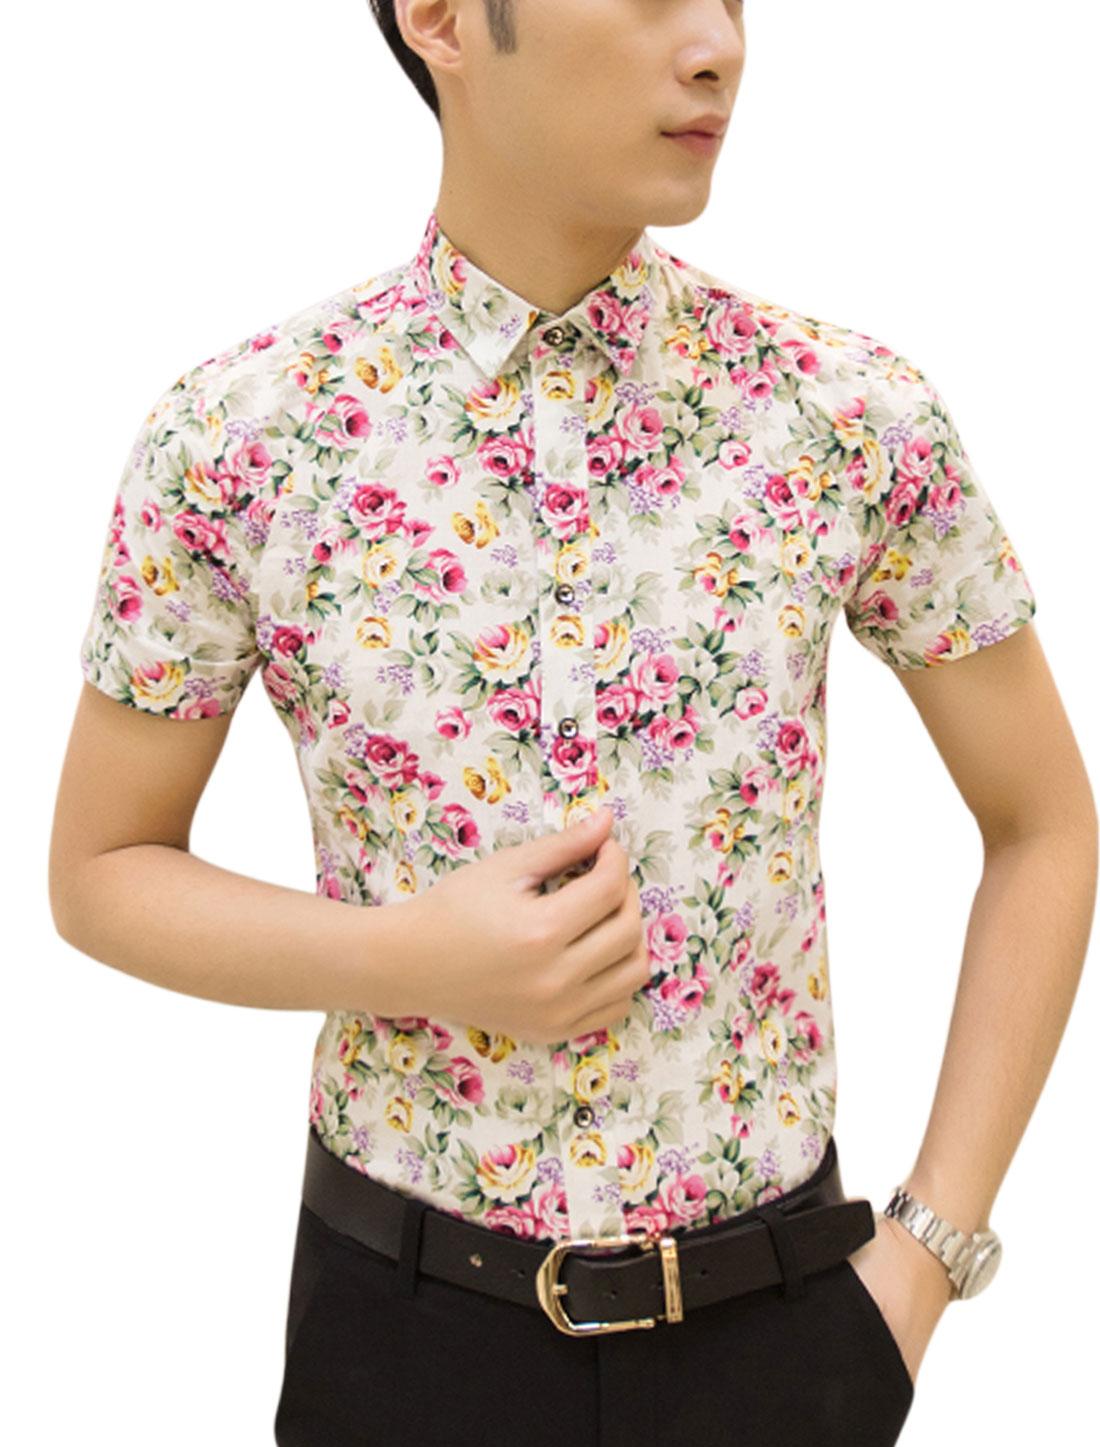 Man Floral Prints Short Sleeves Round Hem Leisure Shirts Biege Fuchsia M